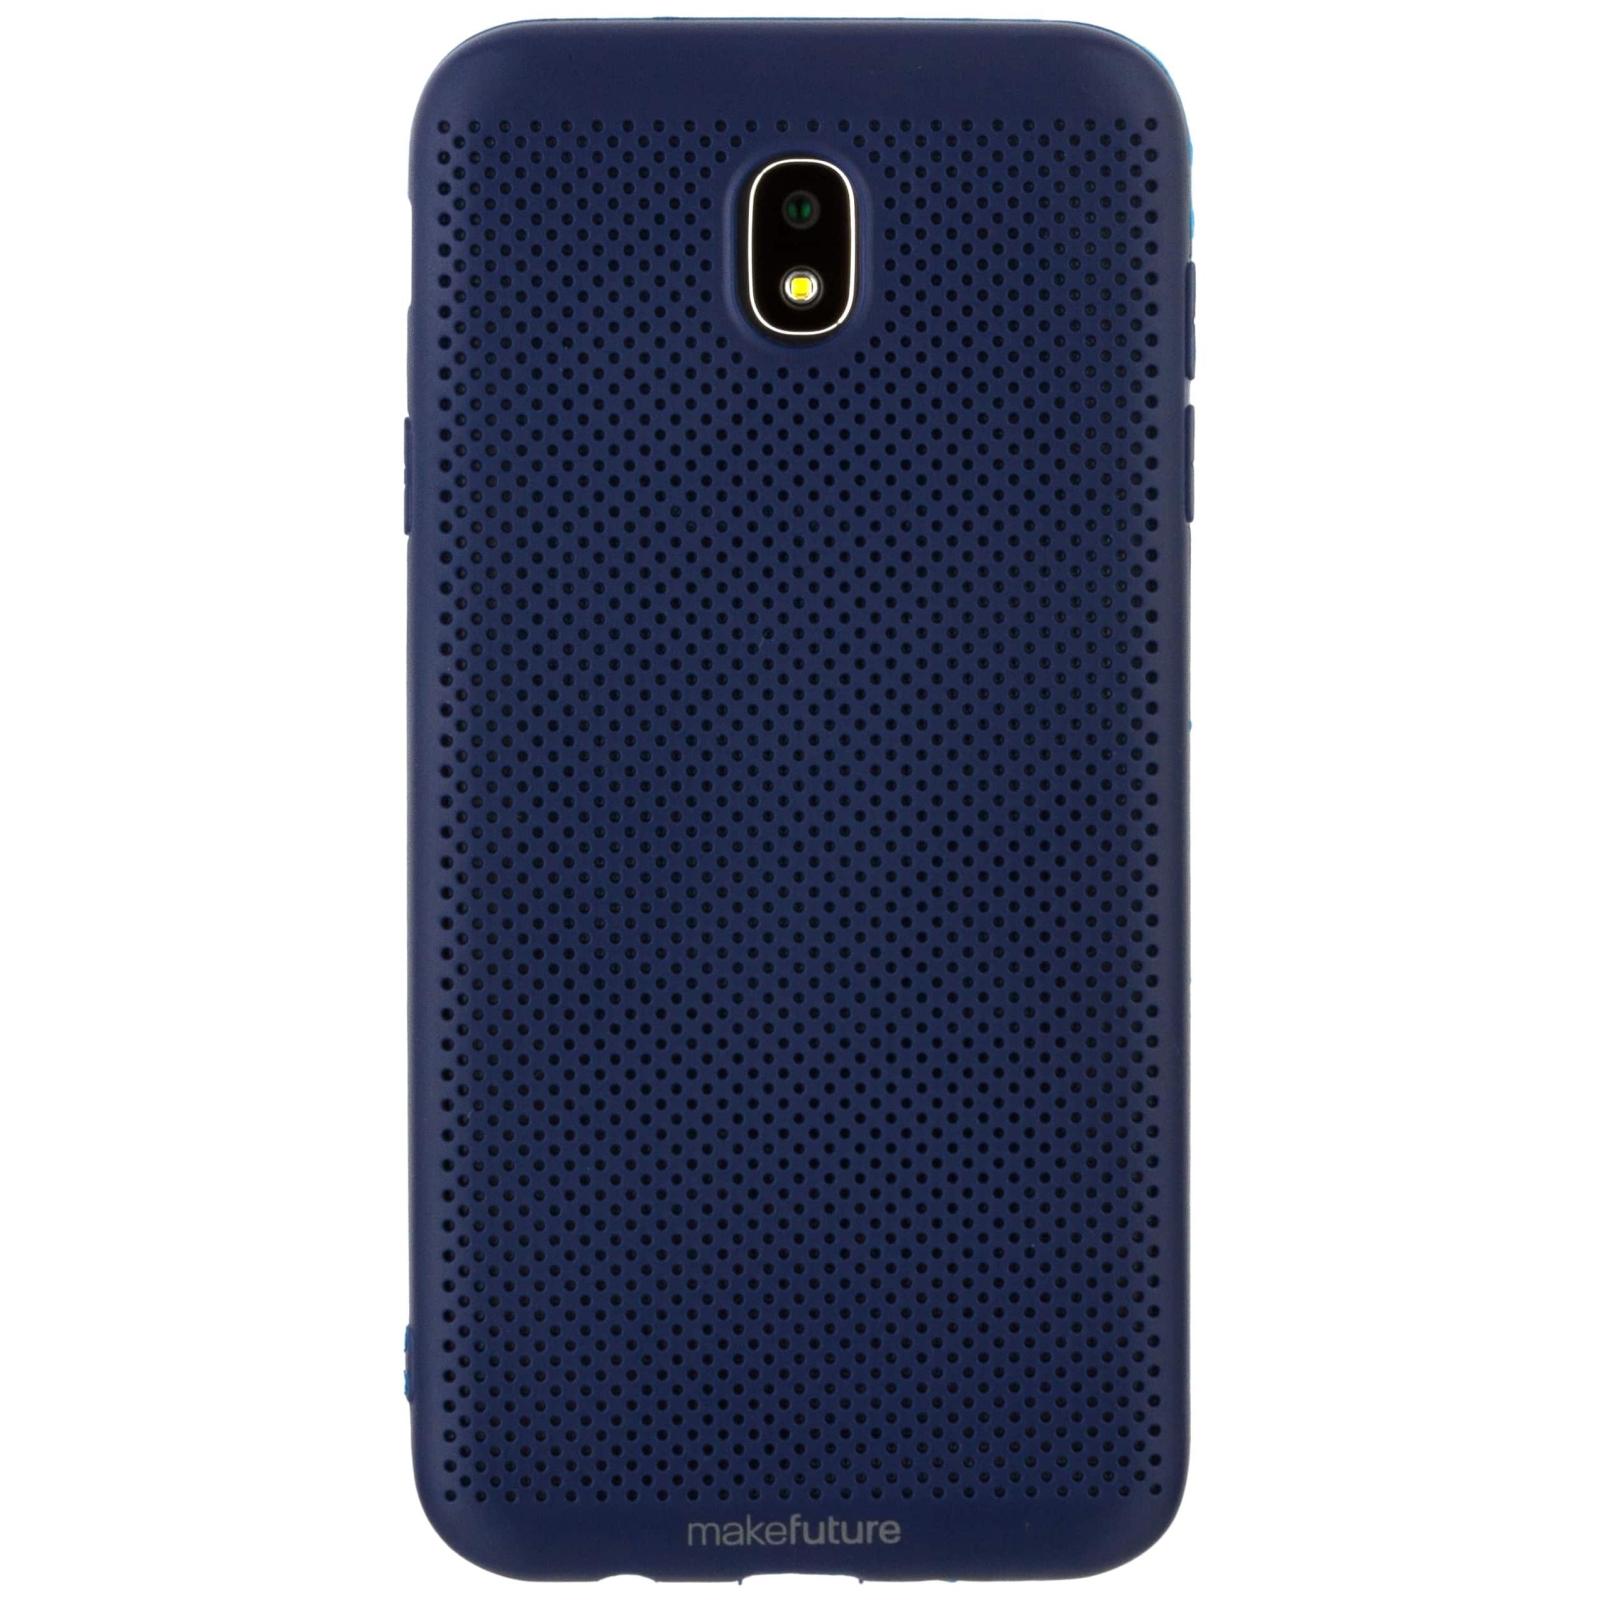 Чехол для моб. телефона MakeFuture Moon Case (TPU) для Samsung J7 2017 (J730) Blue (MCM-SJ730BL)